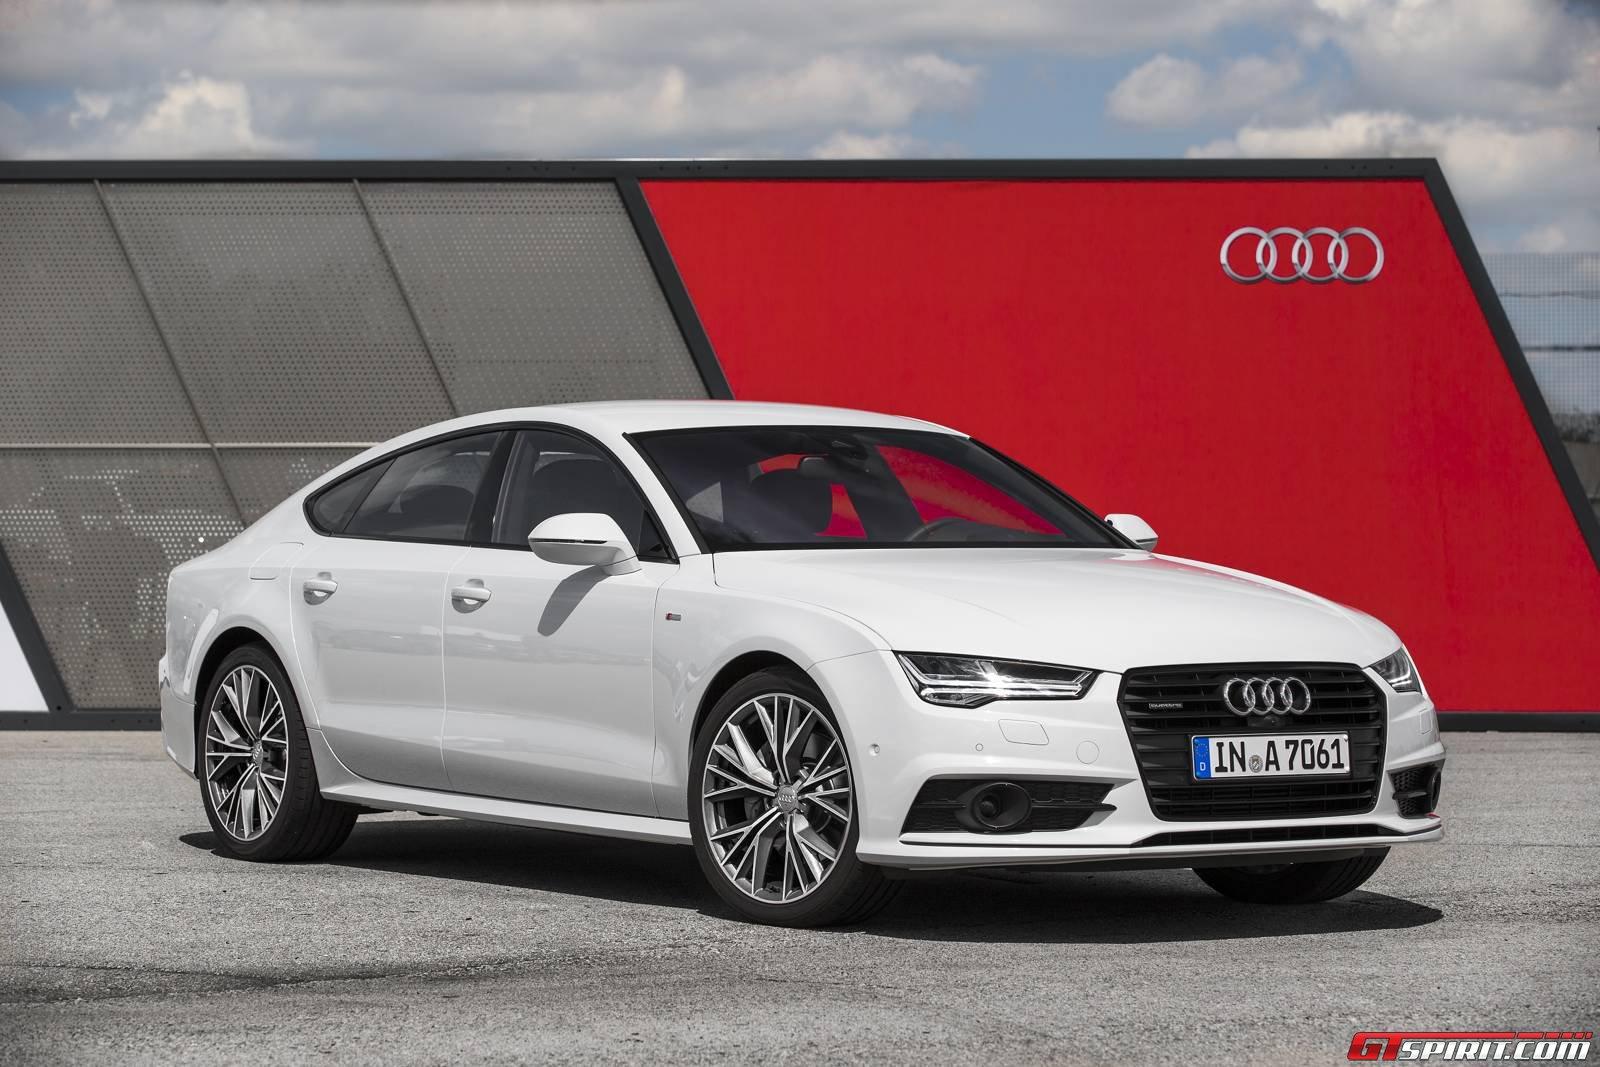 2015 Audi A7 Sportback Facelift Review Gtspirit